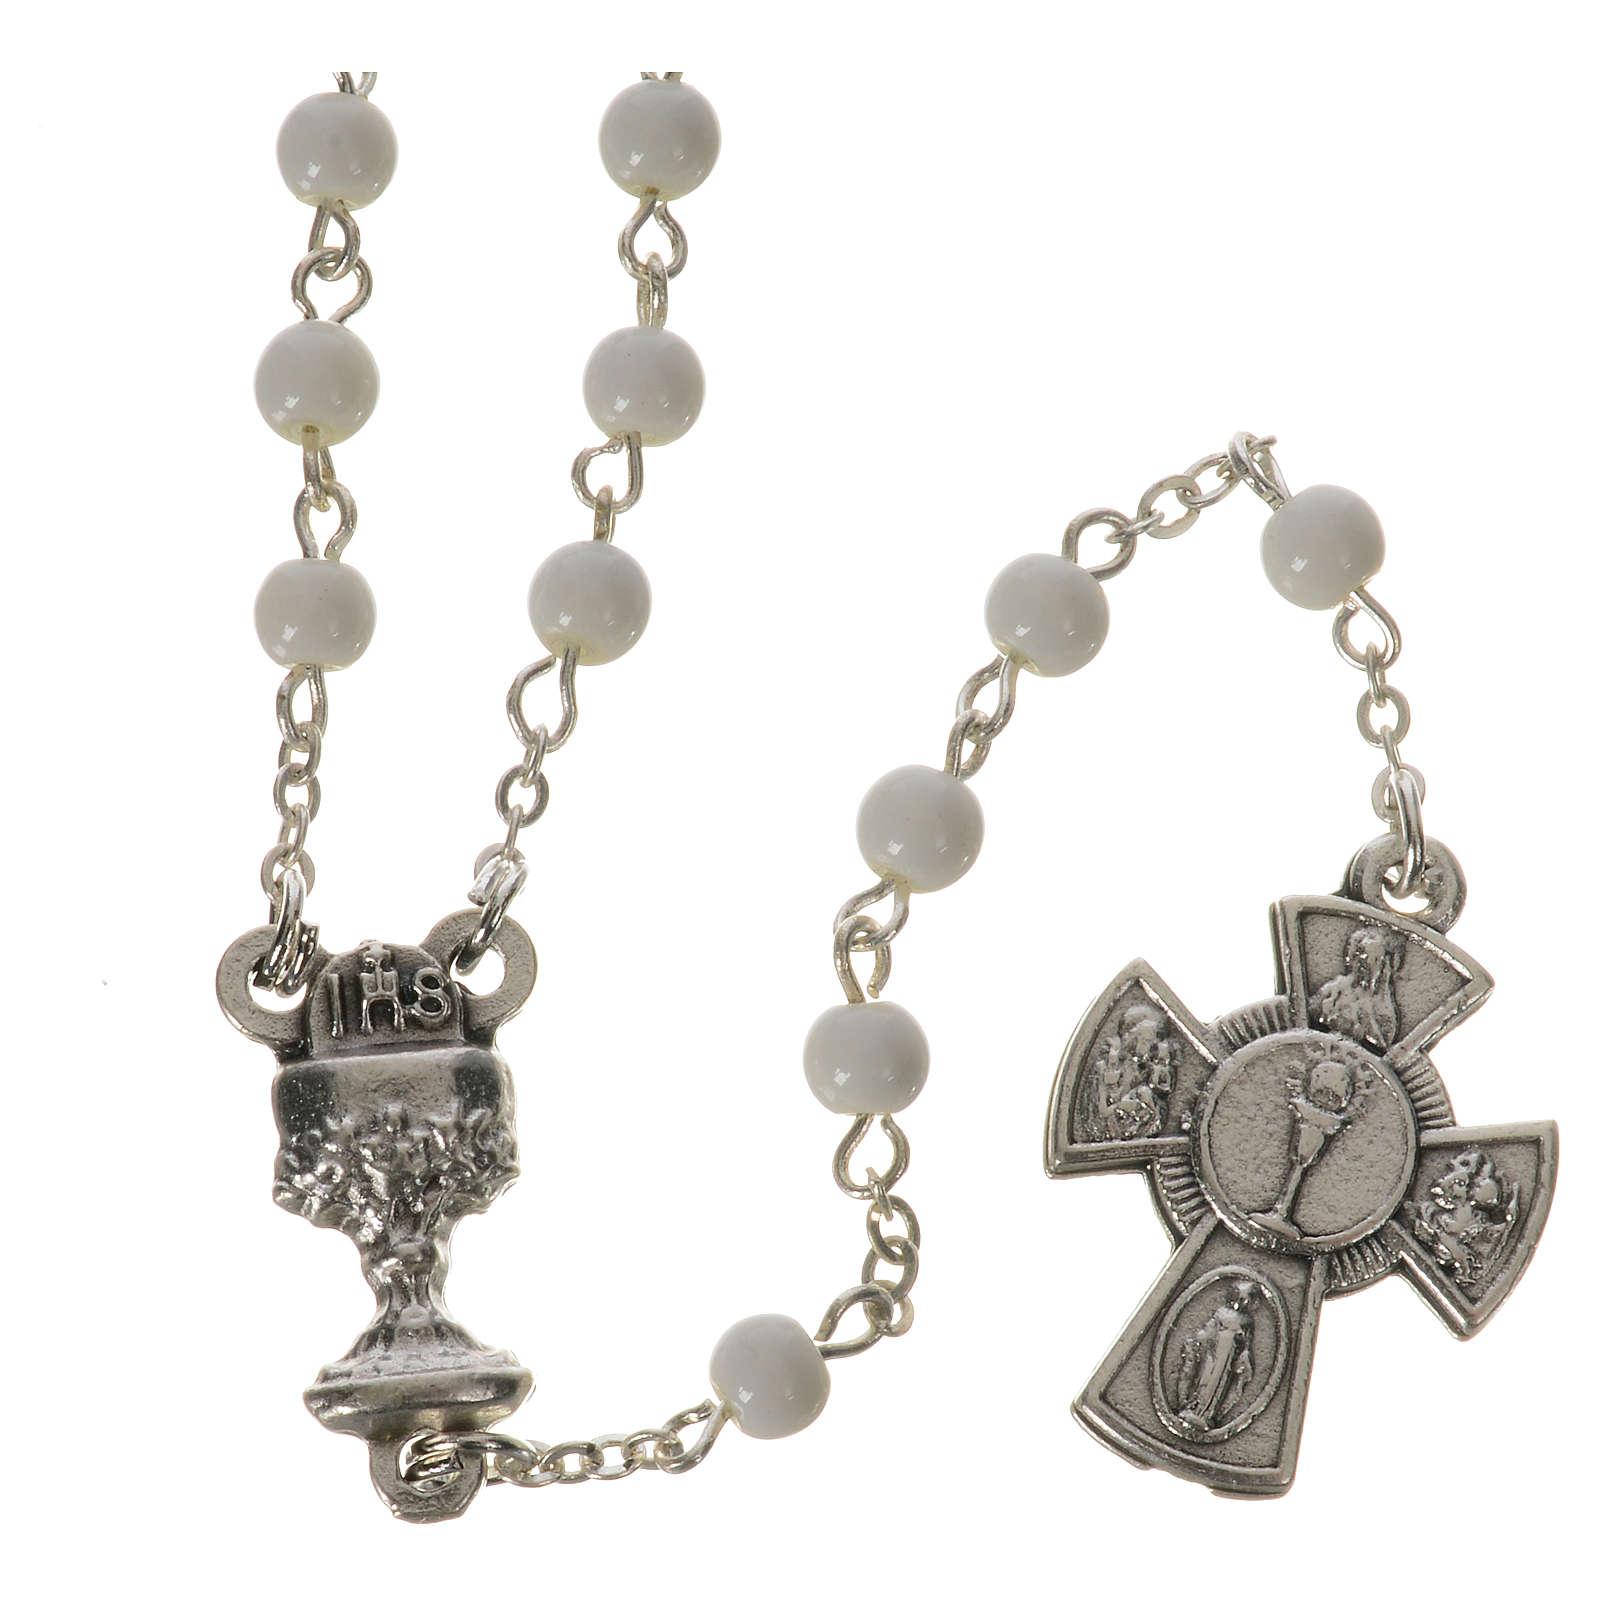 Libretto con rosario First Holy Communion INGLESE 4